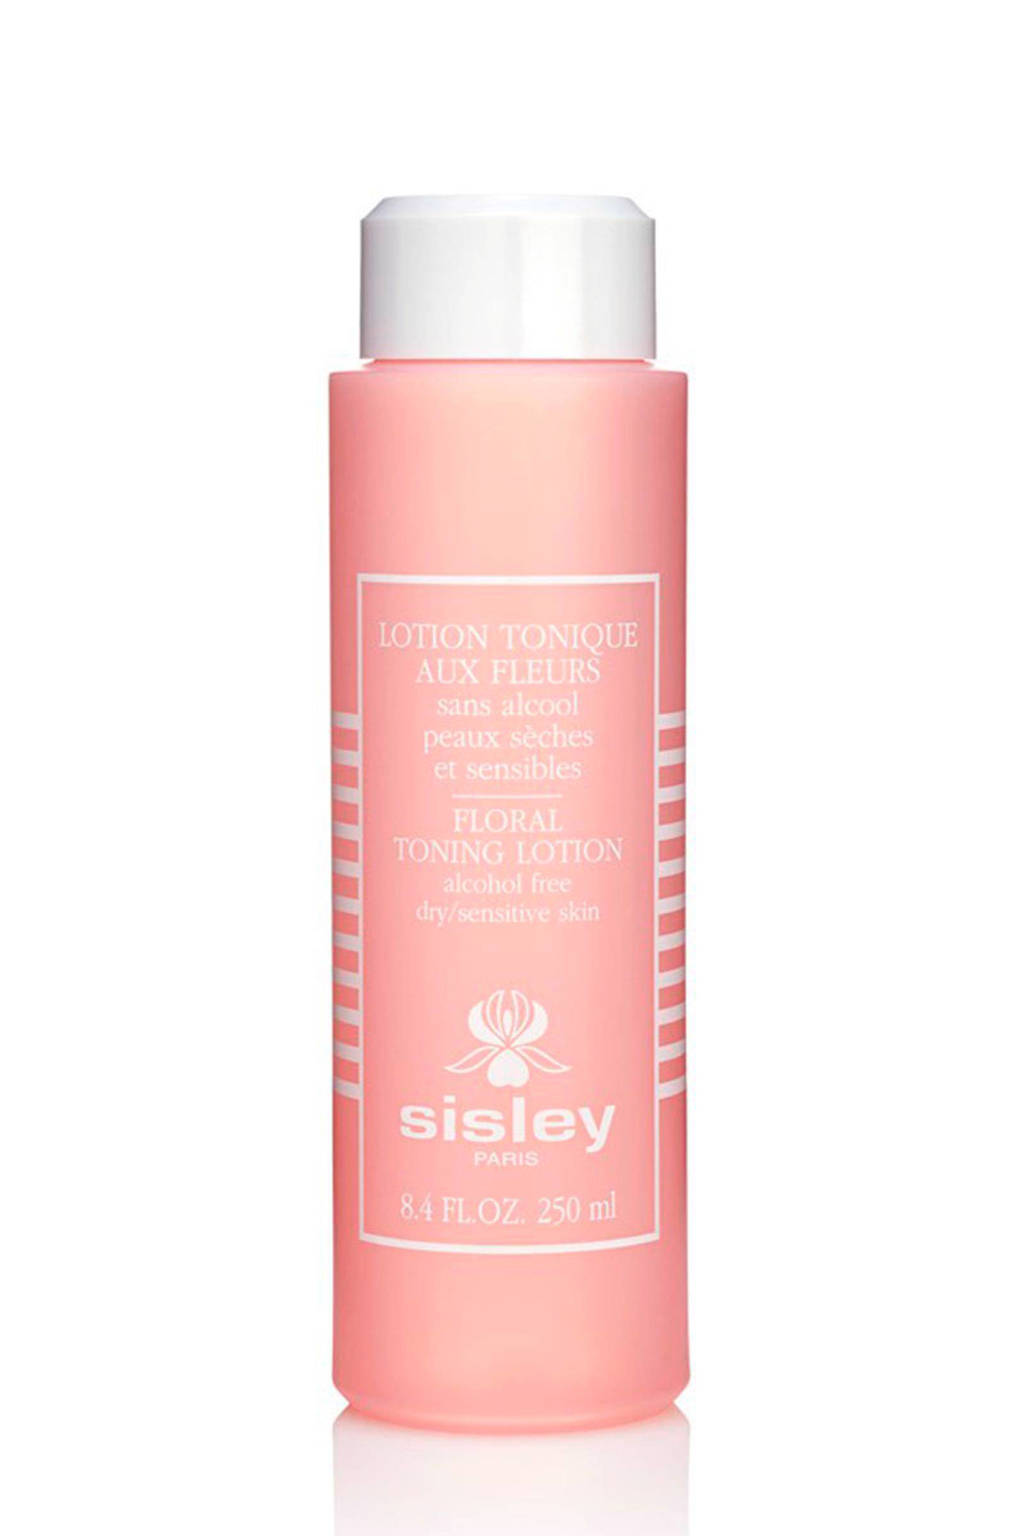 Sisley Lotion Tonique Fleurs - 250 ml